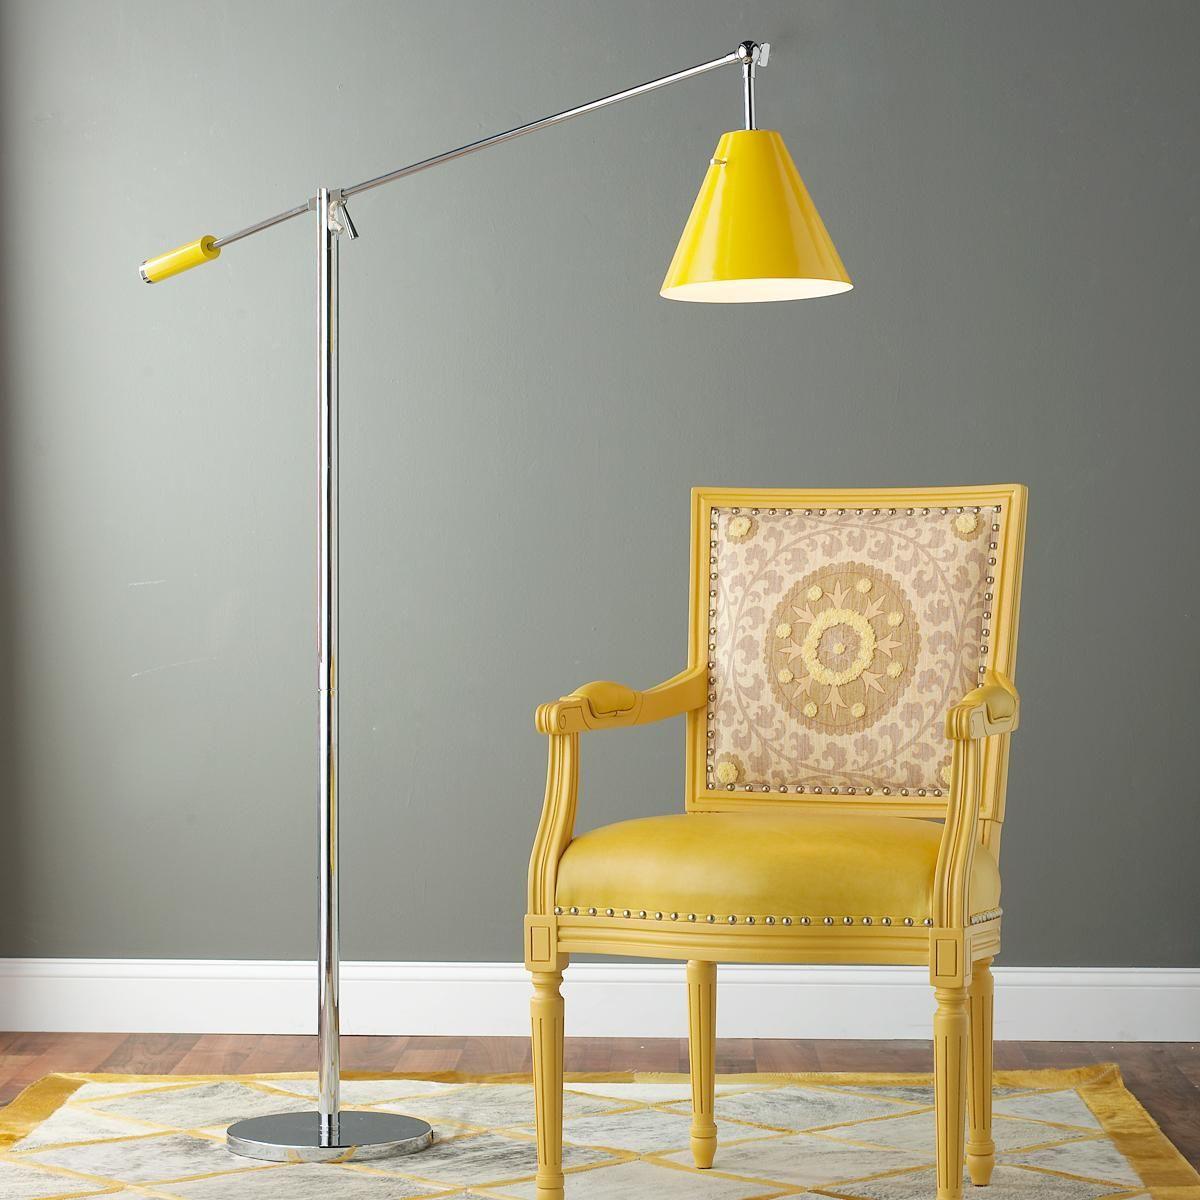 Oversized Modern Lever Arm Floor Lamp Arm floor lamp